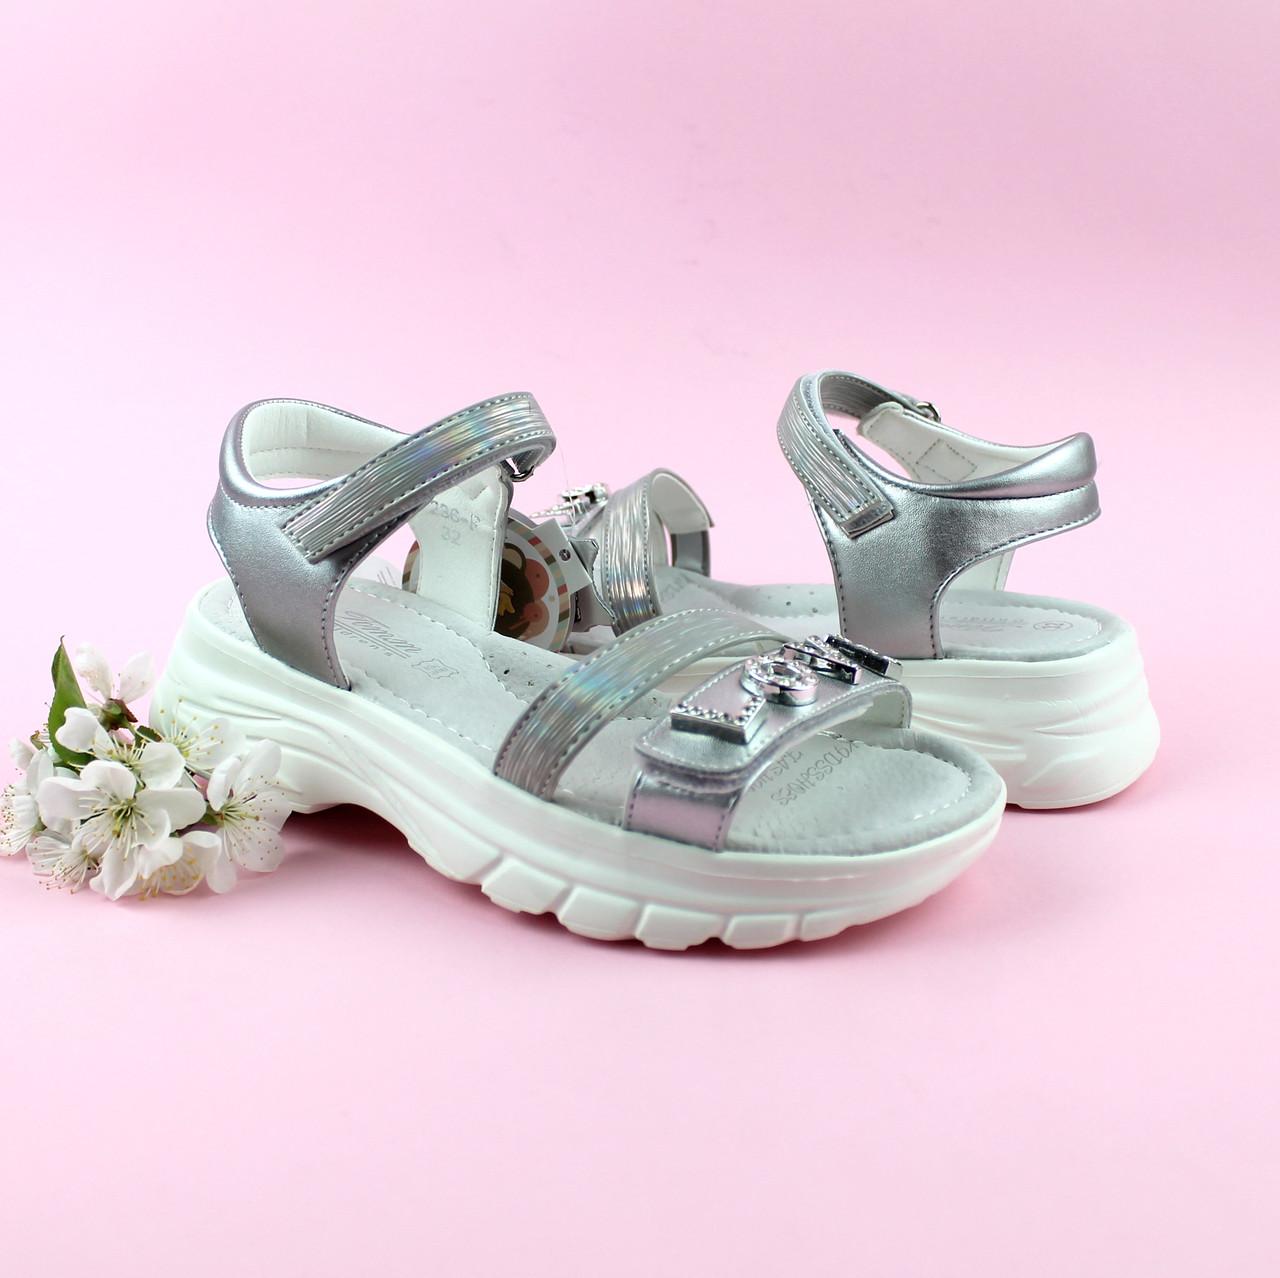 Босоножки для девочки Серебро тм Том.м размер 32,34